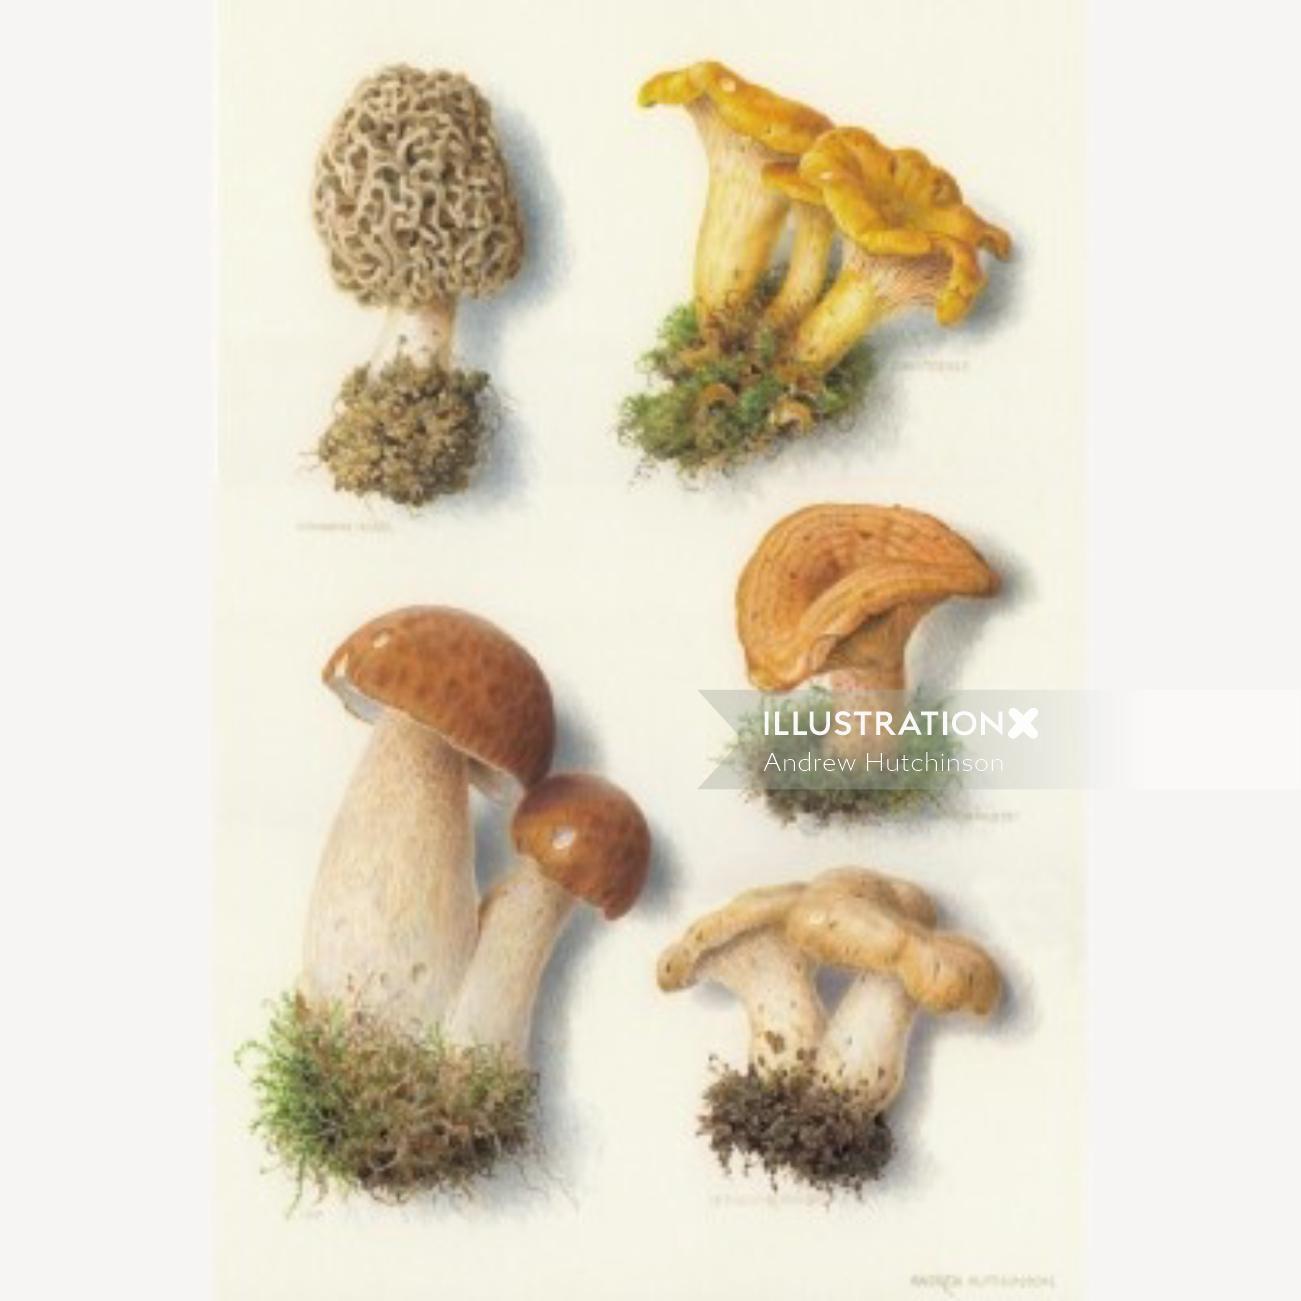 Fungus Illustration, Mushroom images © Andrew Hutchinson